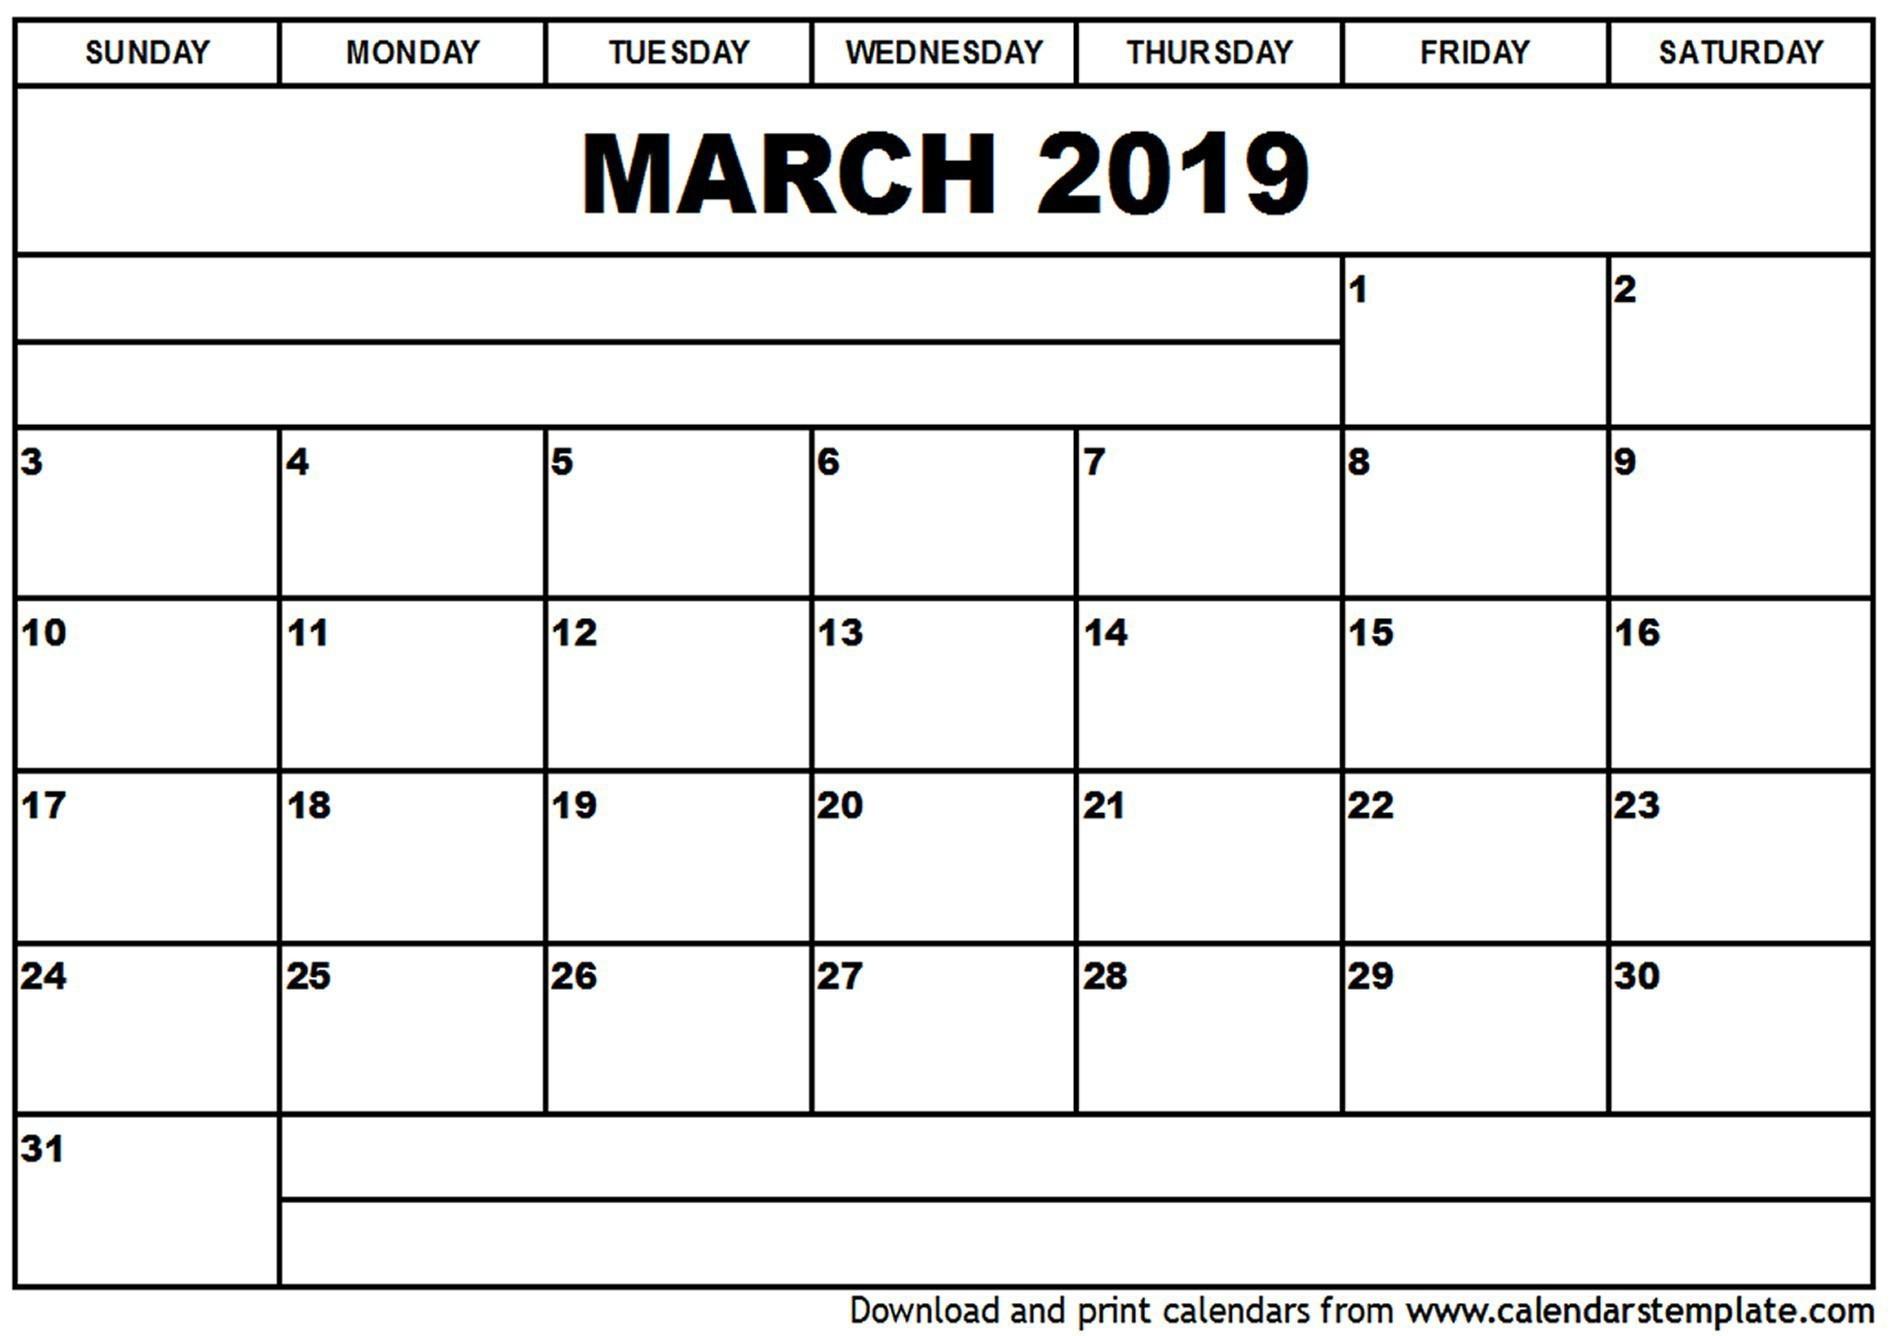 2019 Calendar Pdf File Printable Free Calendars 2019 Printable 2019 Calendar Pages Free 2019 Calendar